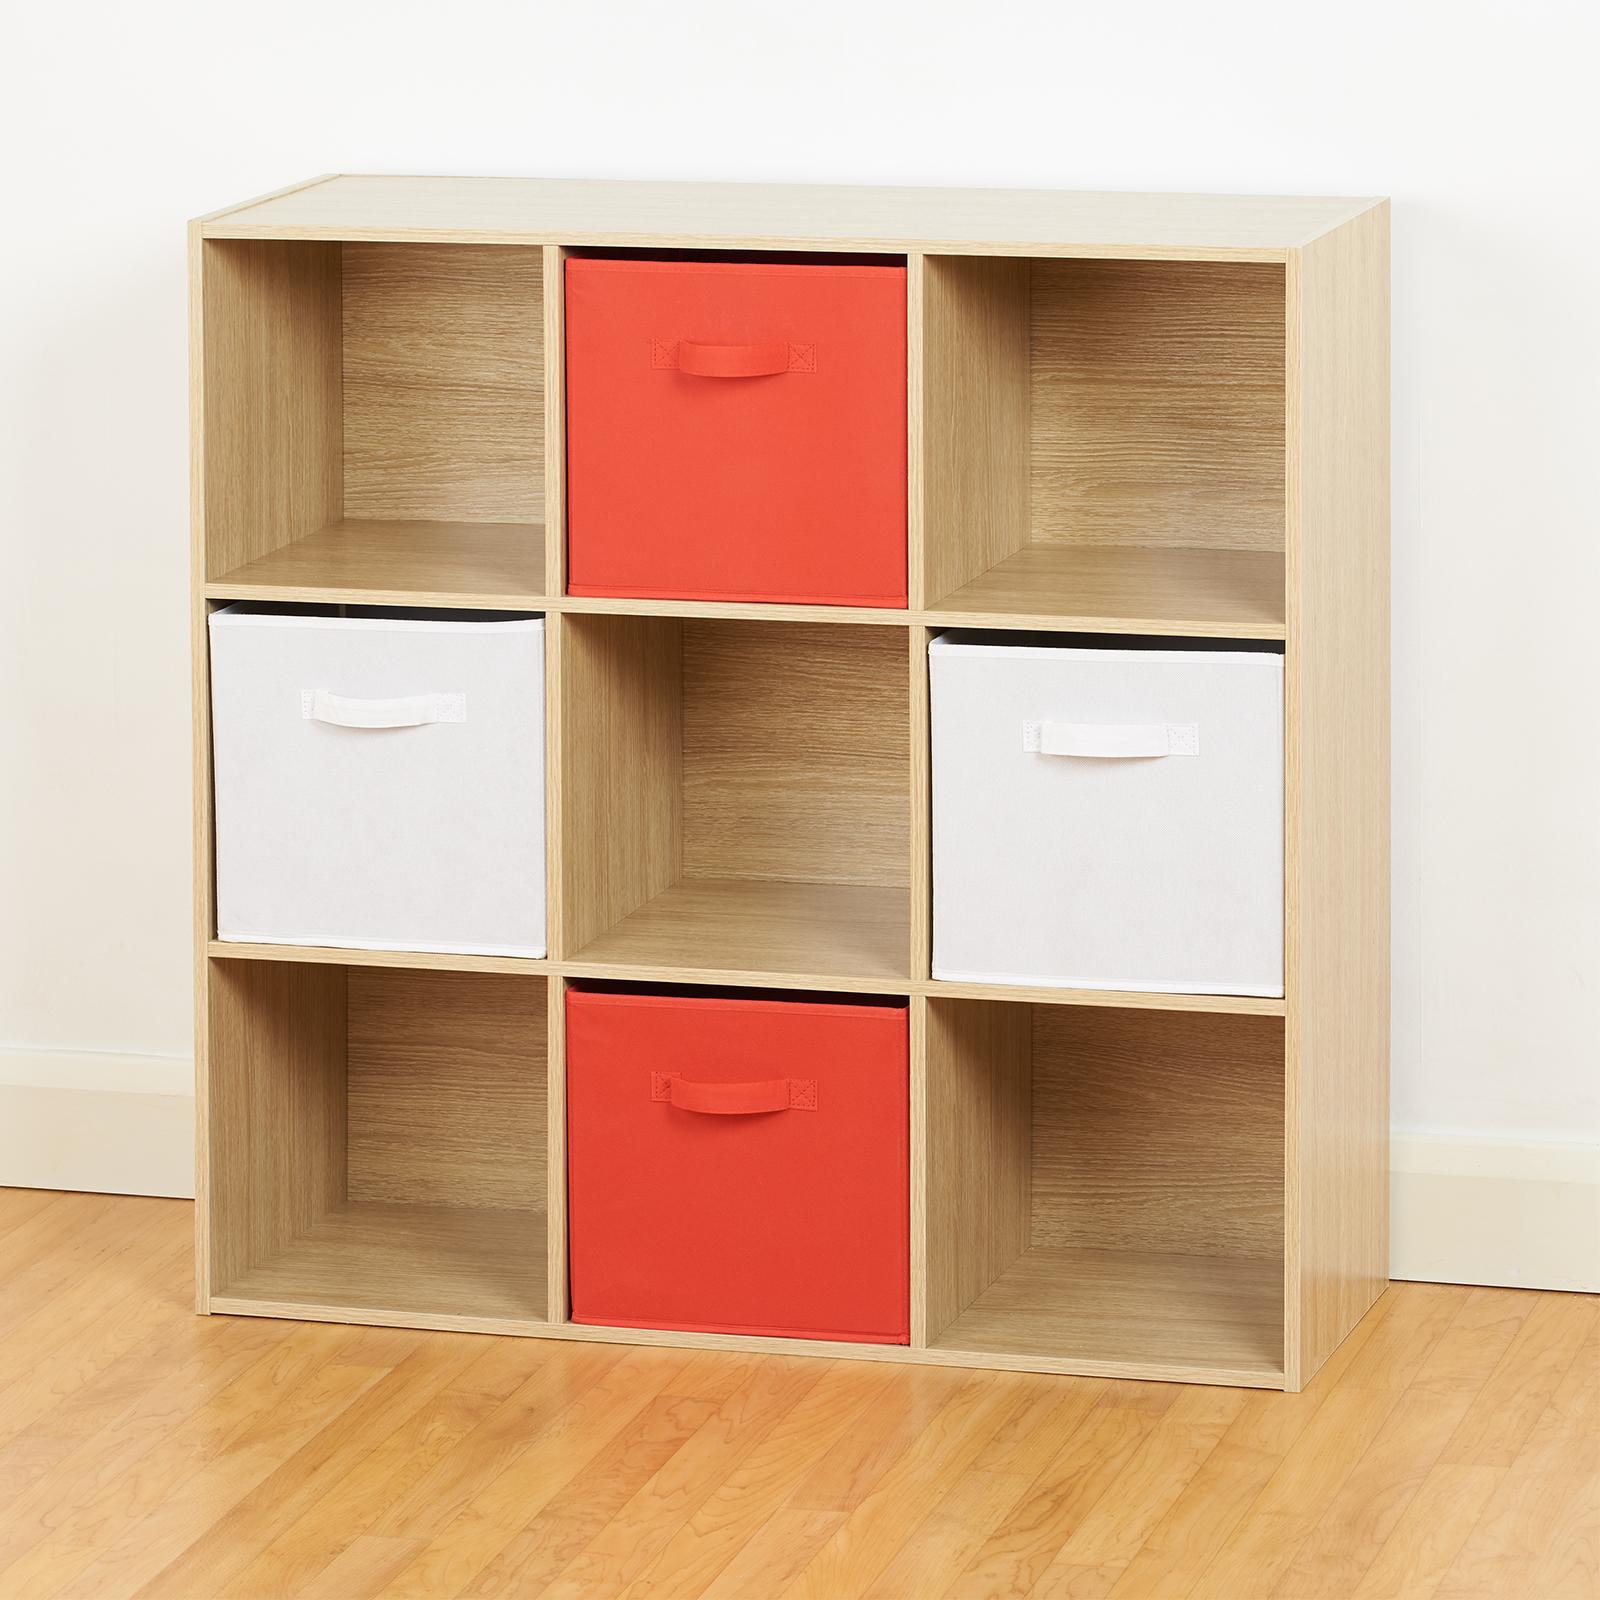 Kids Storage Cube Organizer Toy Box Kids Bedroom Furniture: Oak 9 Cube Storage Unit White & Red Boxes Childrens/Kids